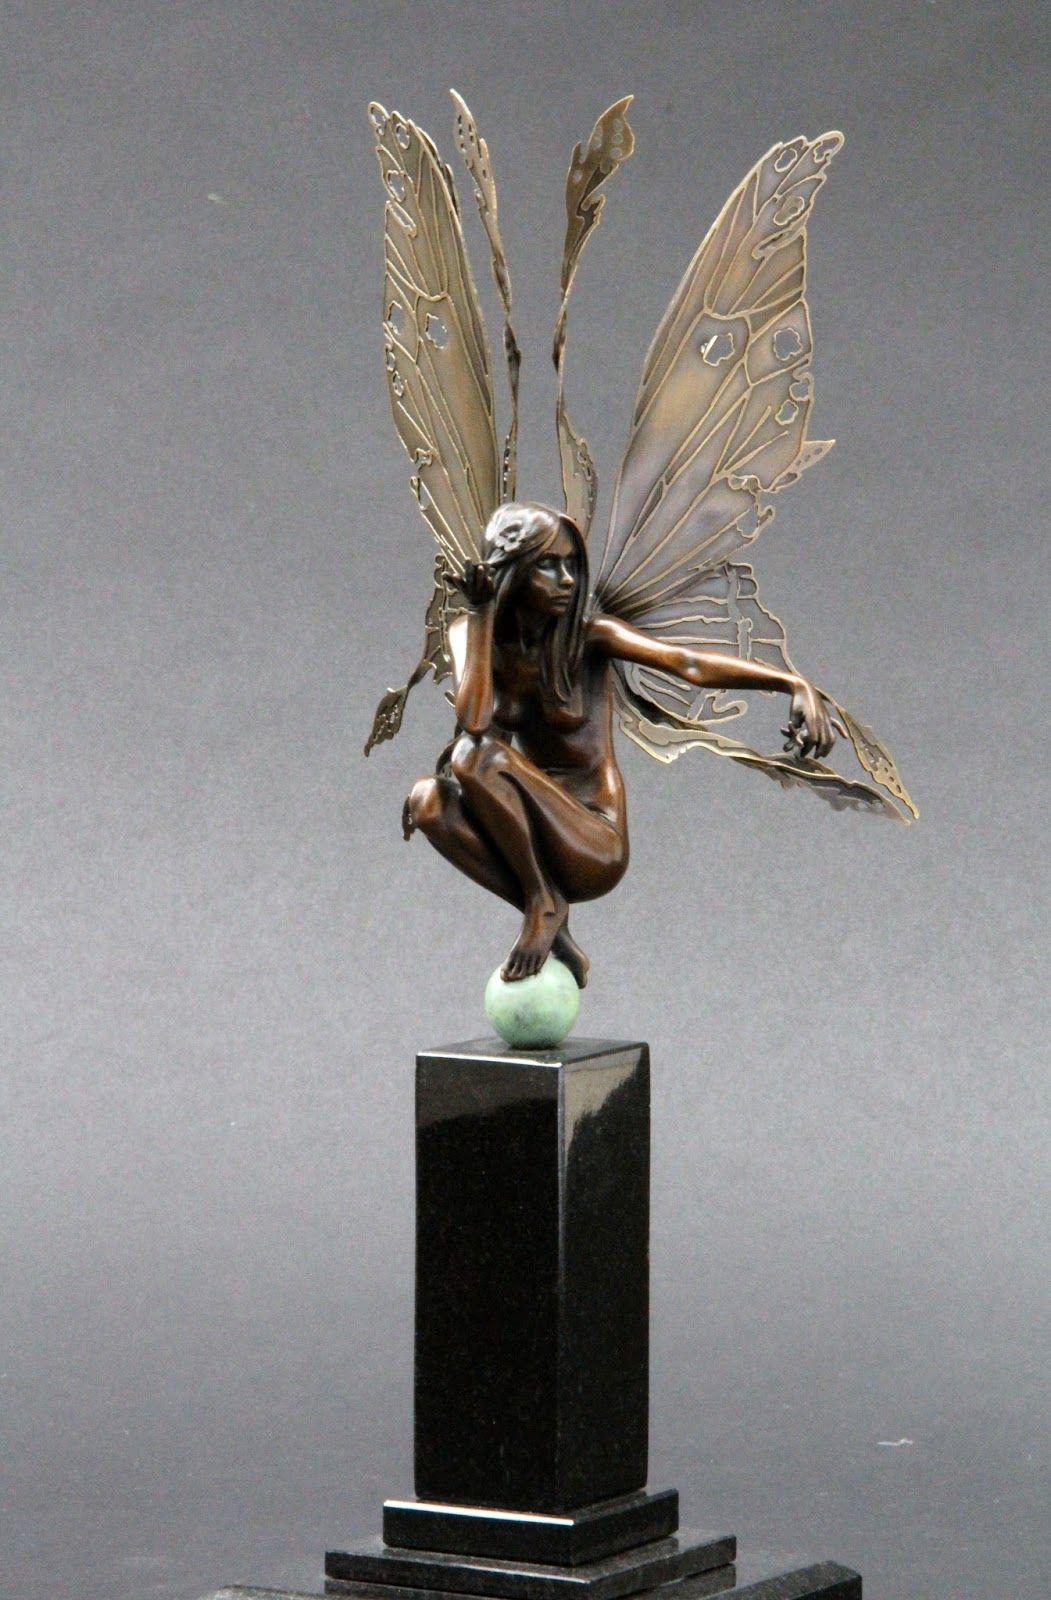 Michael Talbot - Art around the world : http://www.maslindo.com